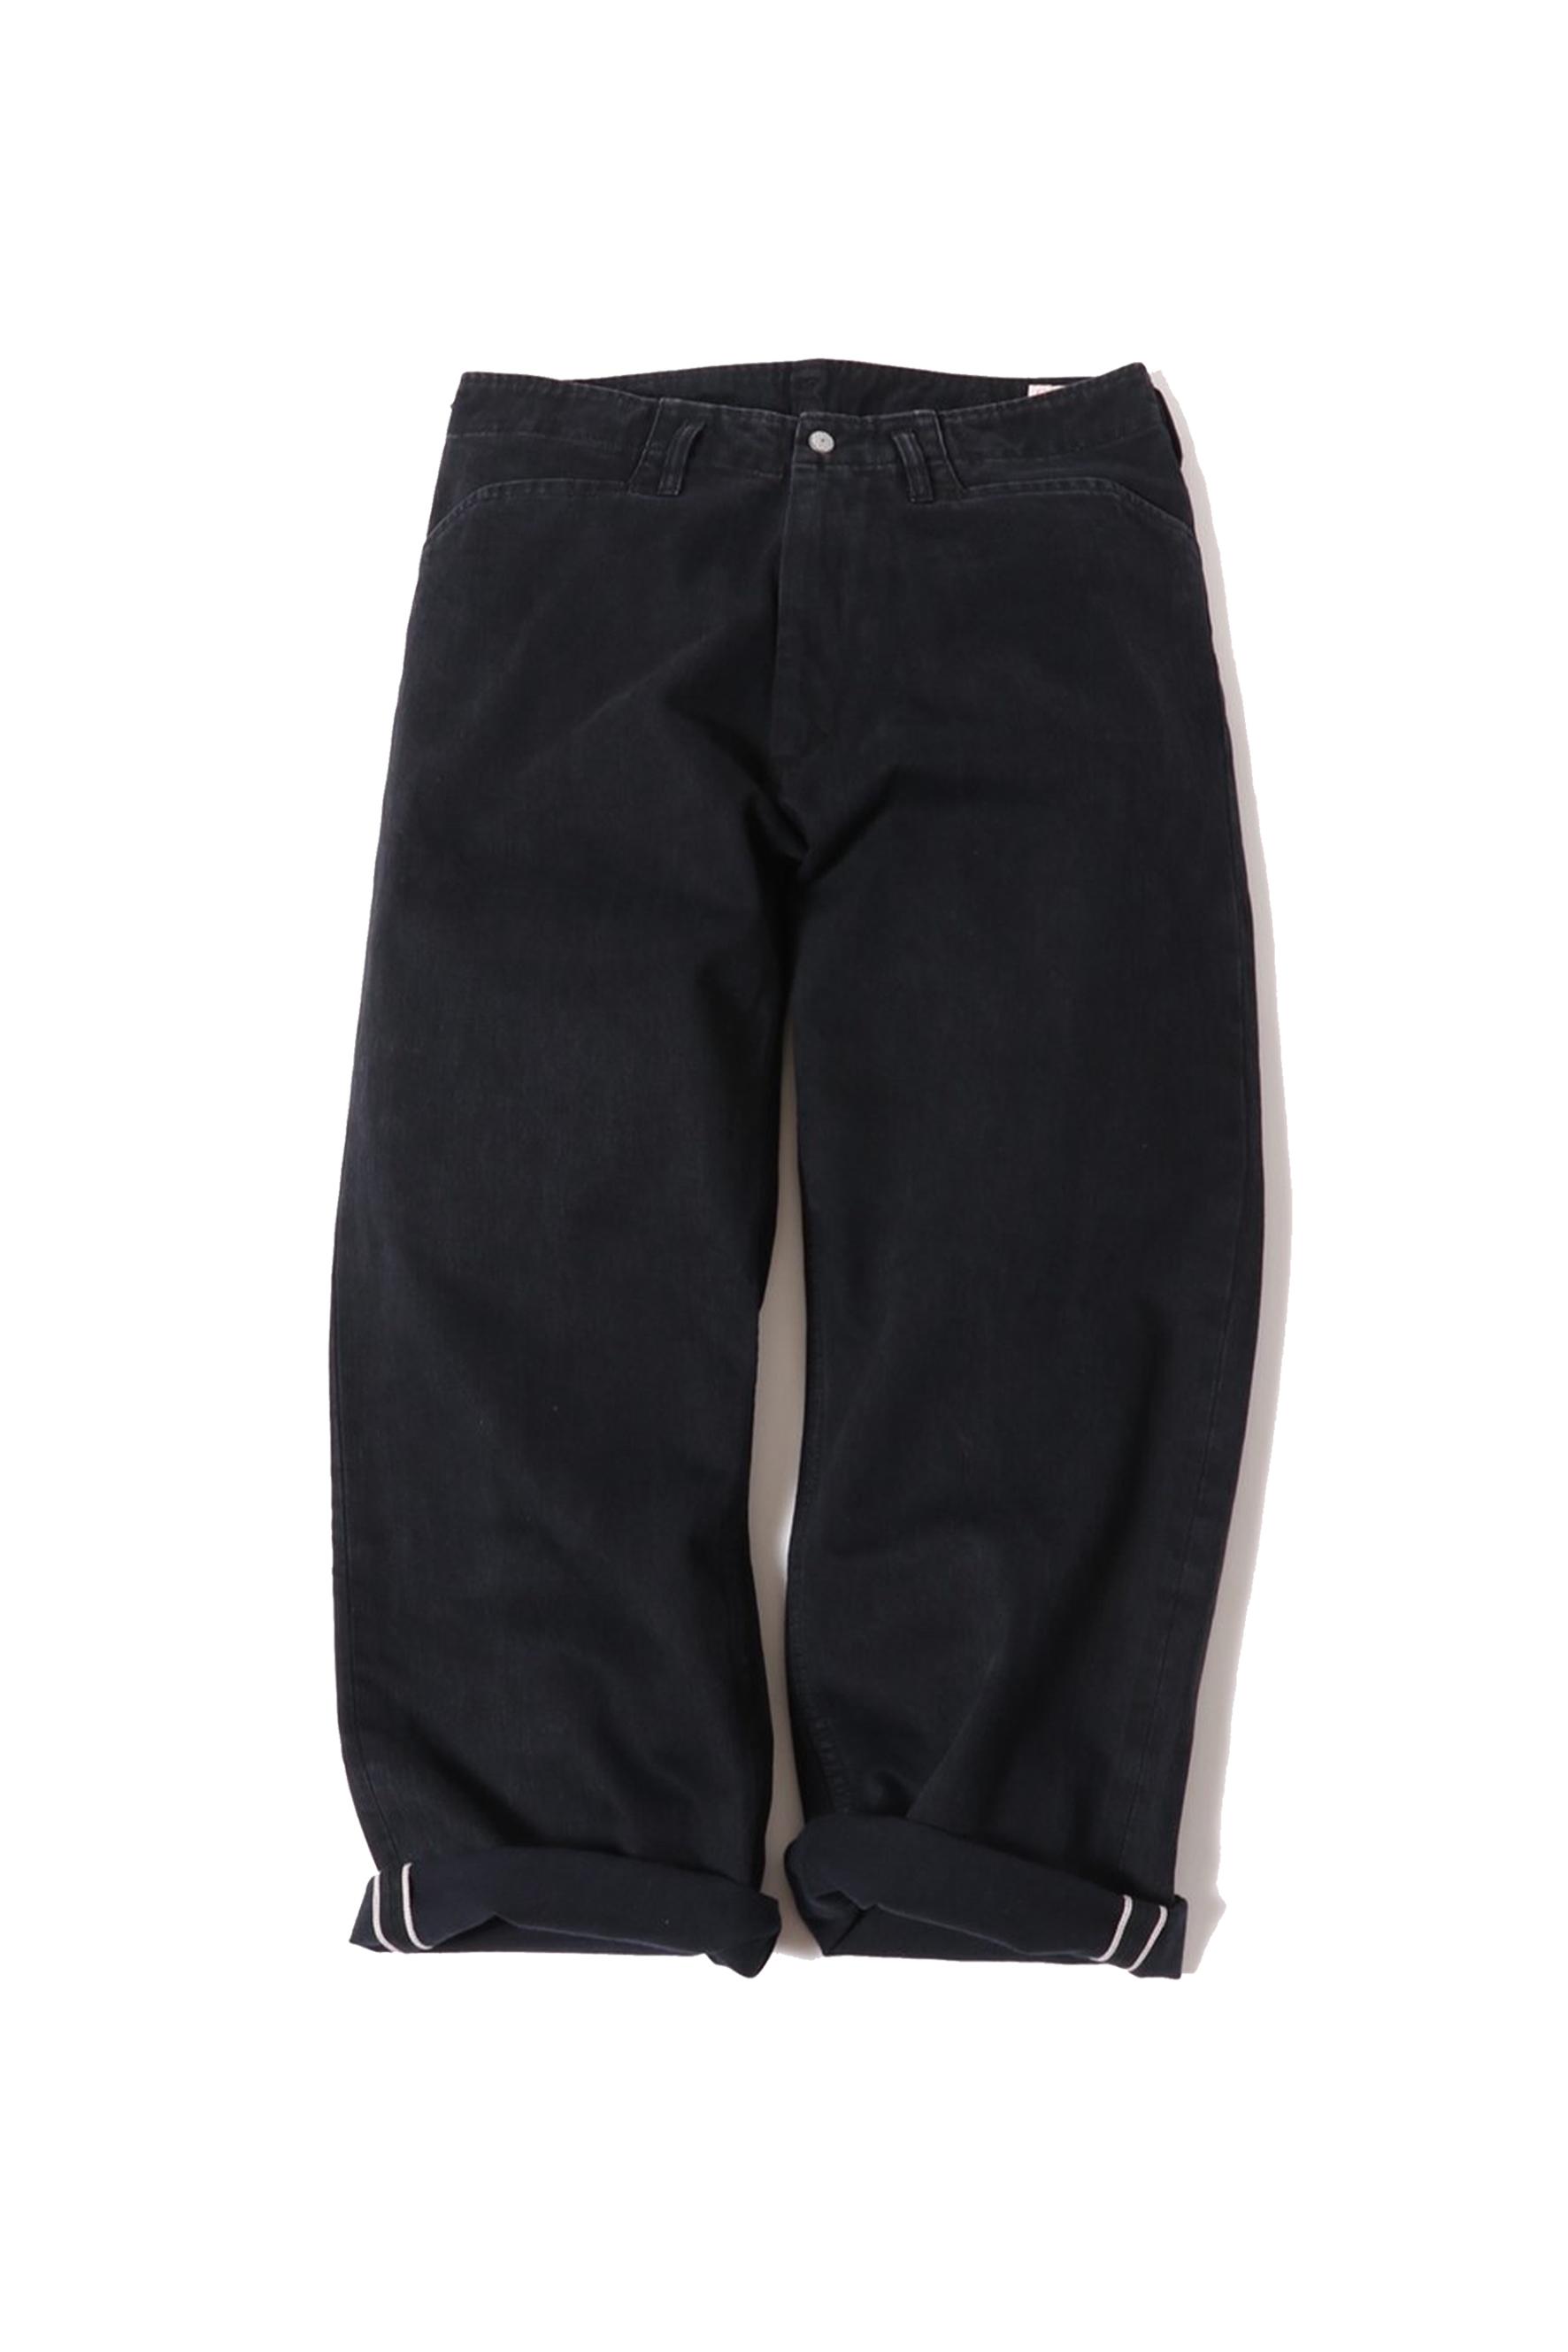 13oz Denim Frisco Pants / onewash / black